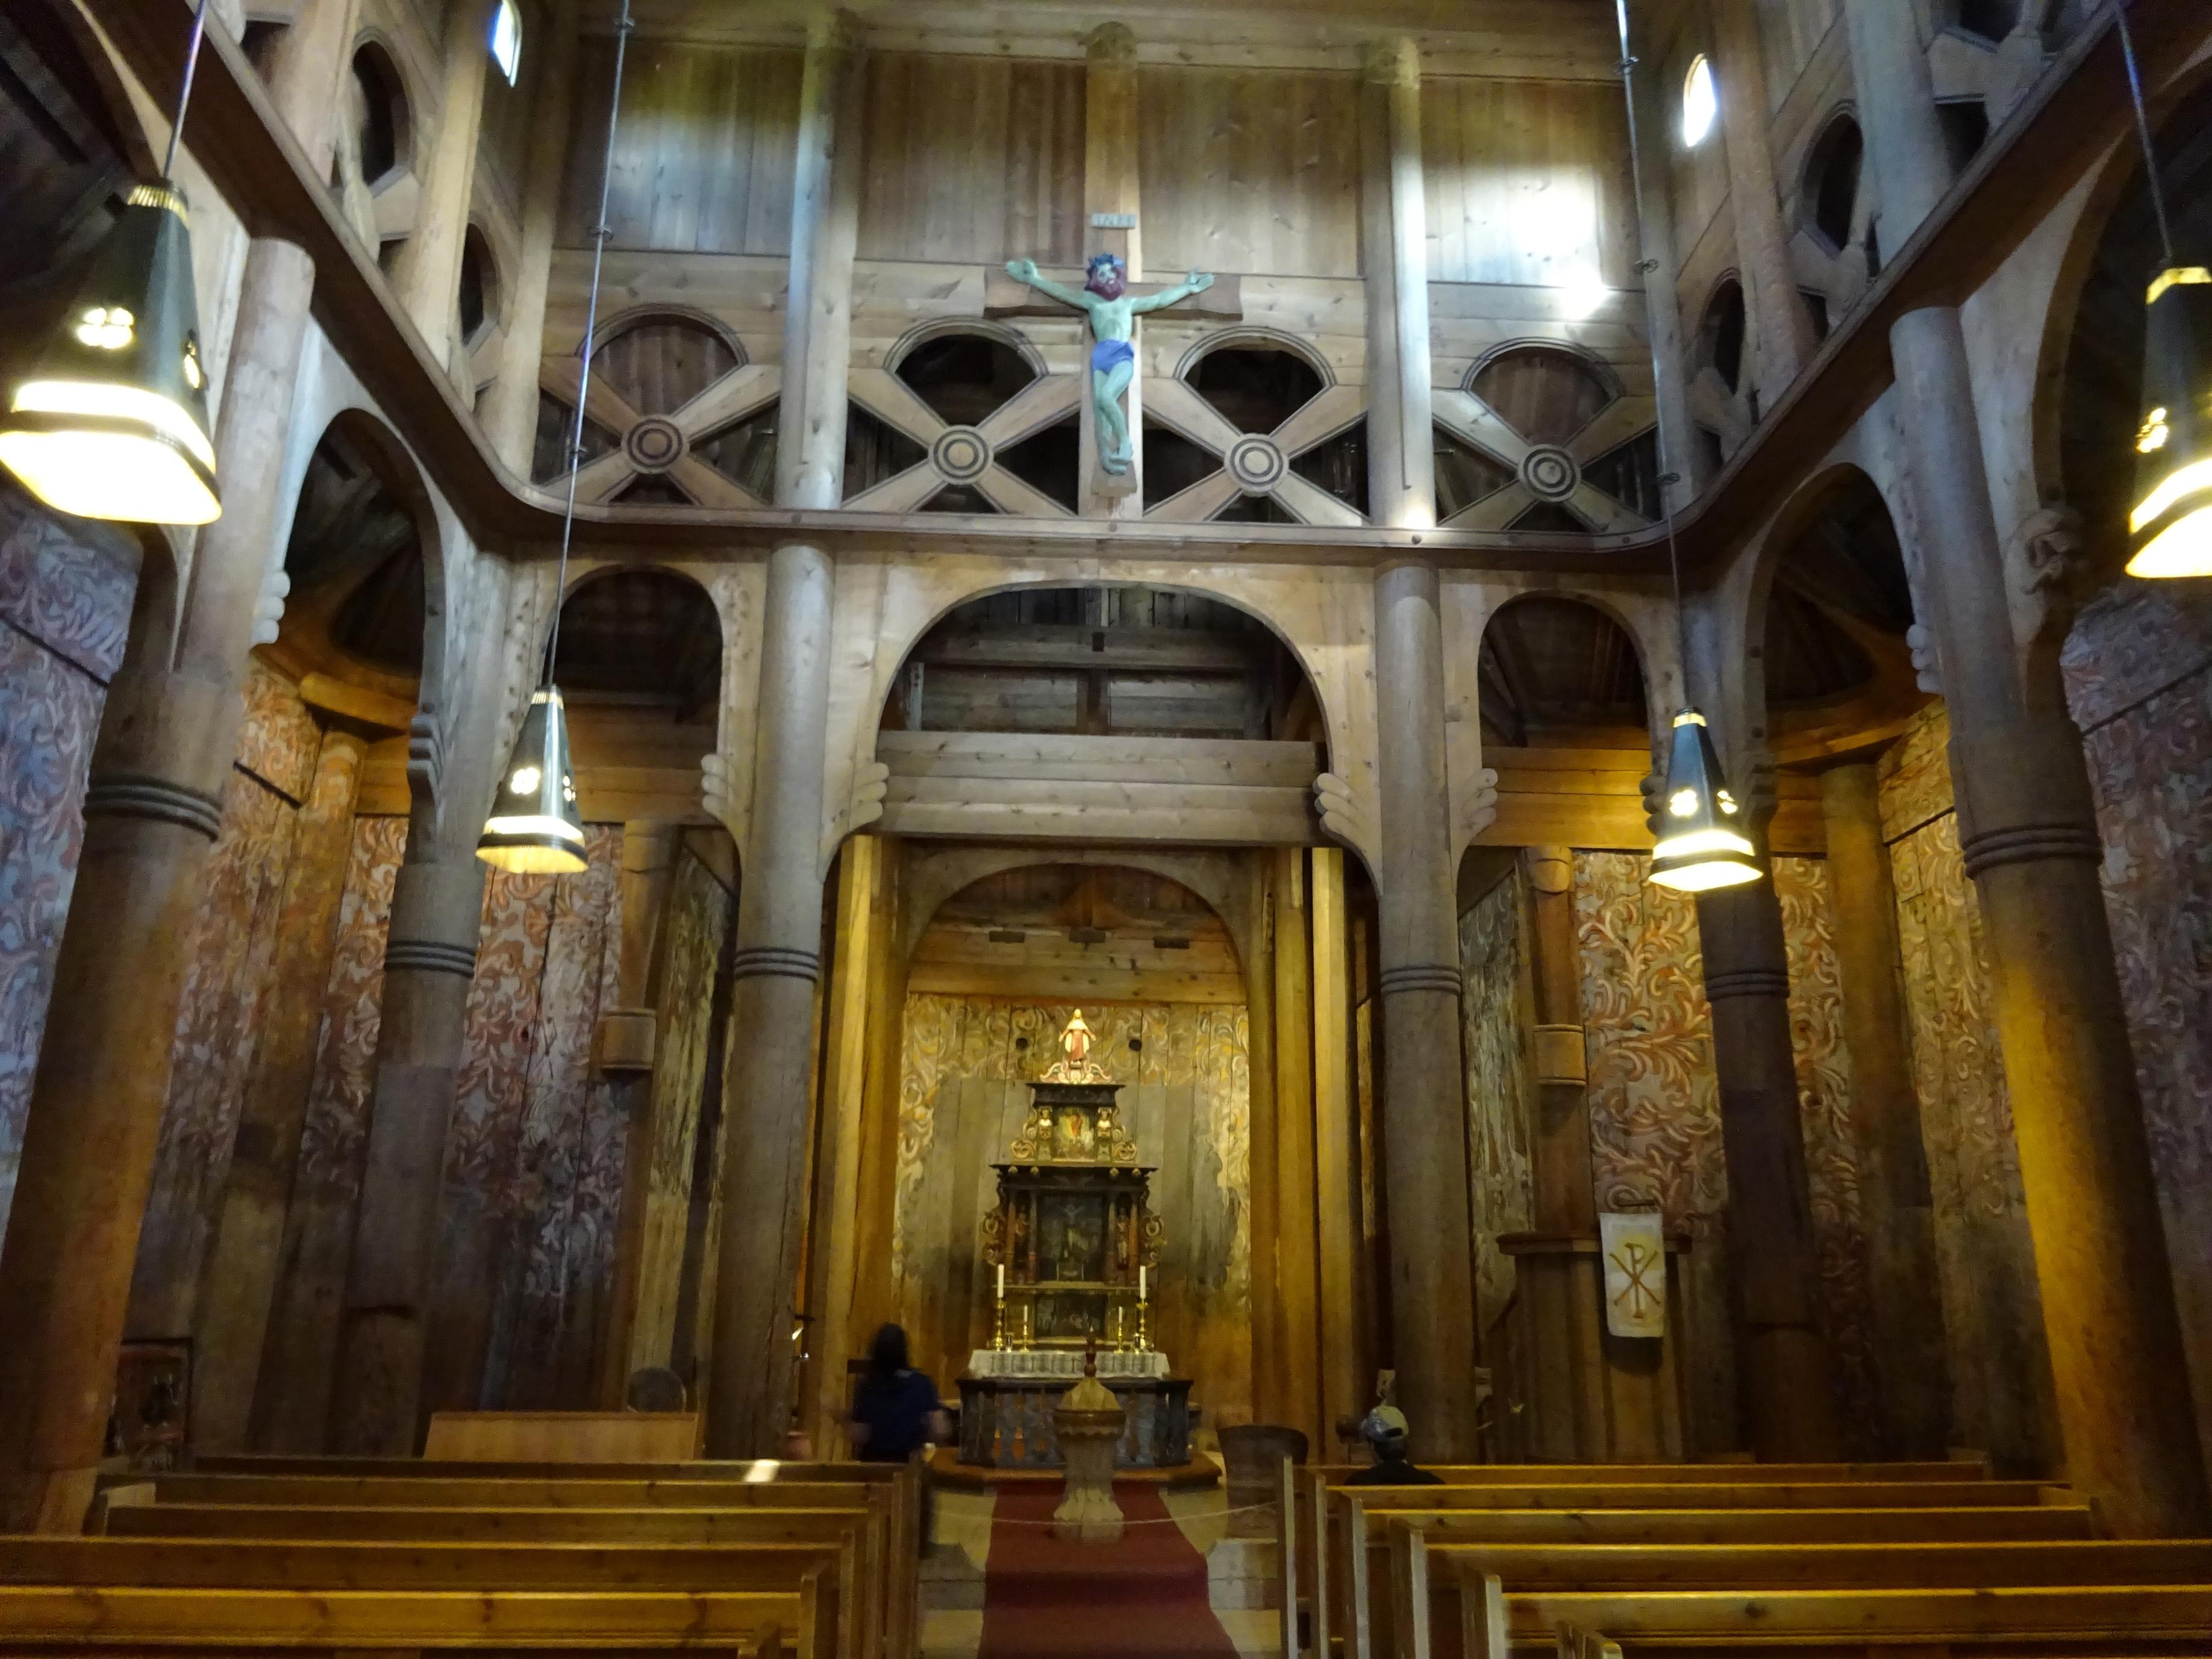 blog_d13s02_heddal_stave_church_011.jpg